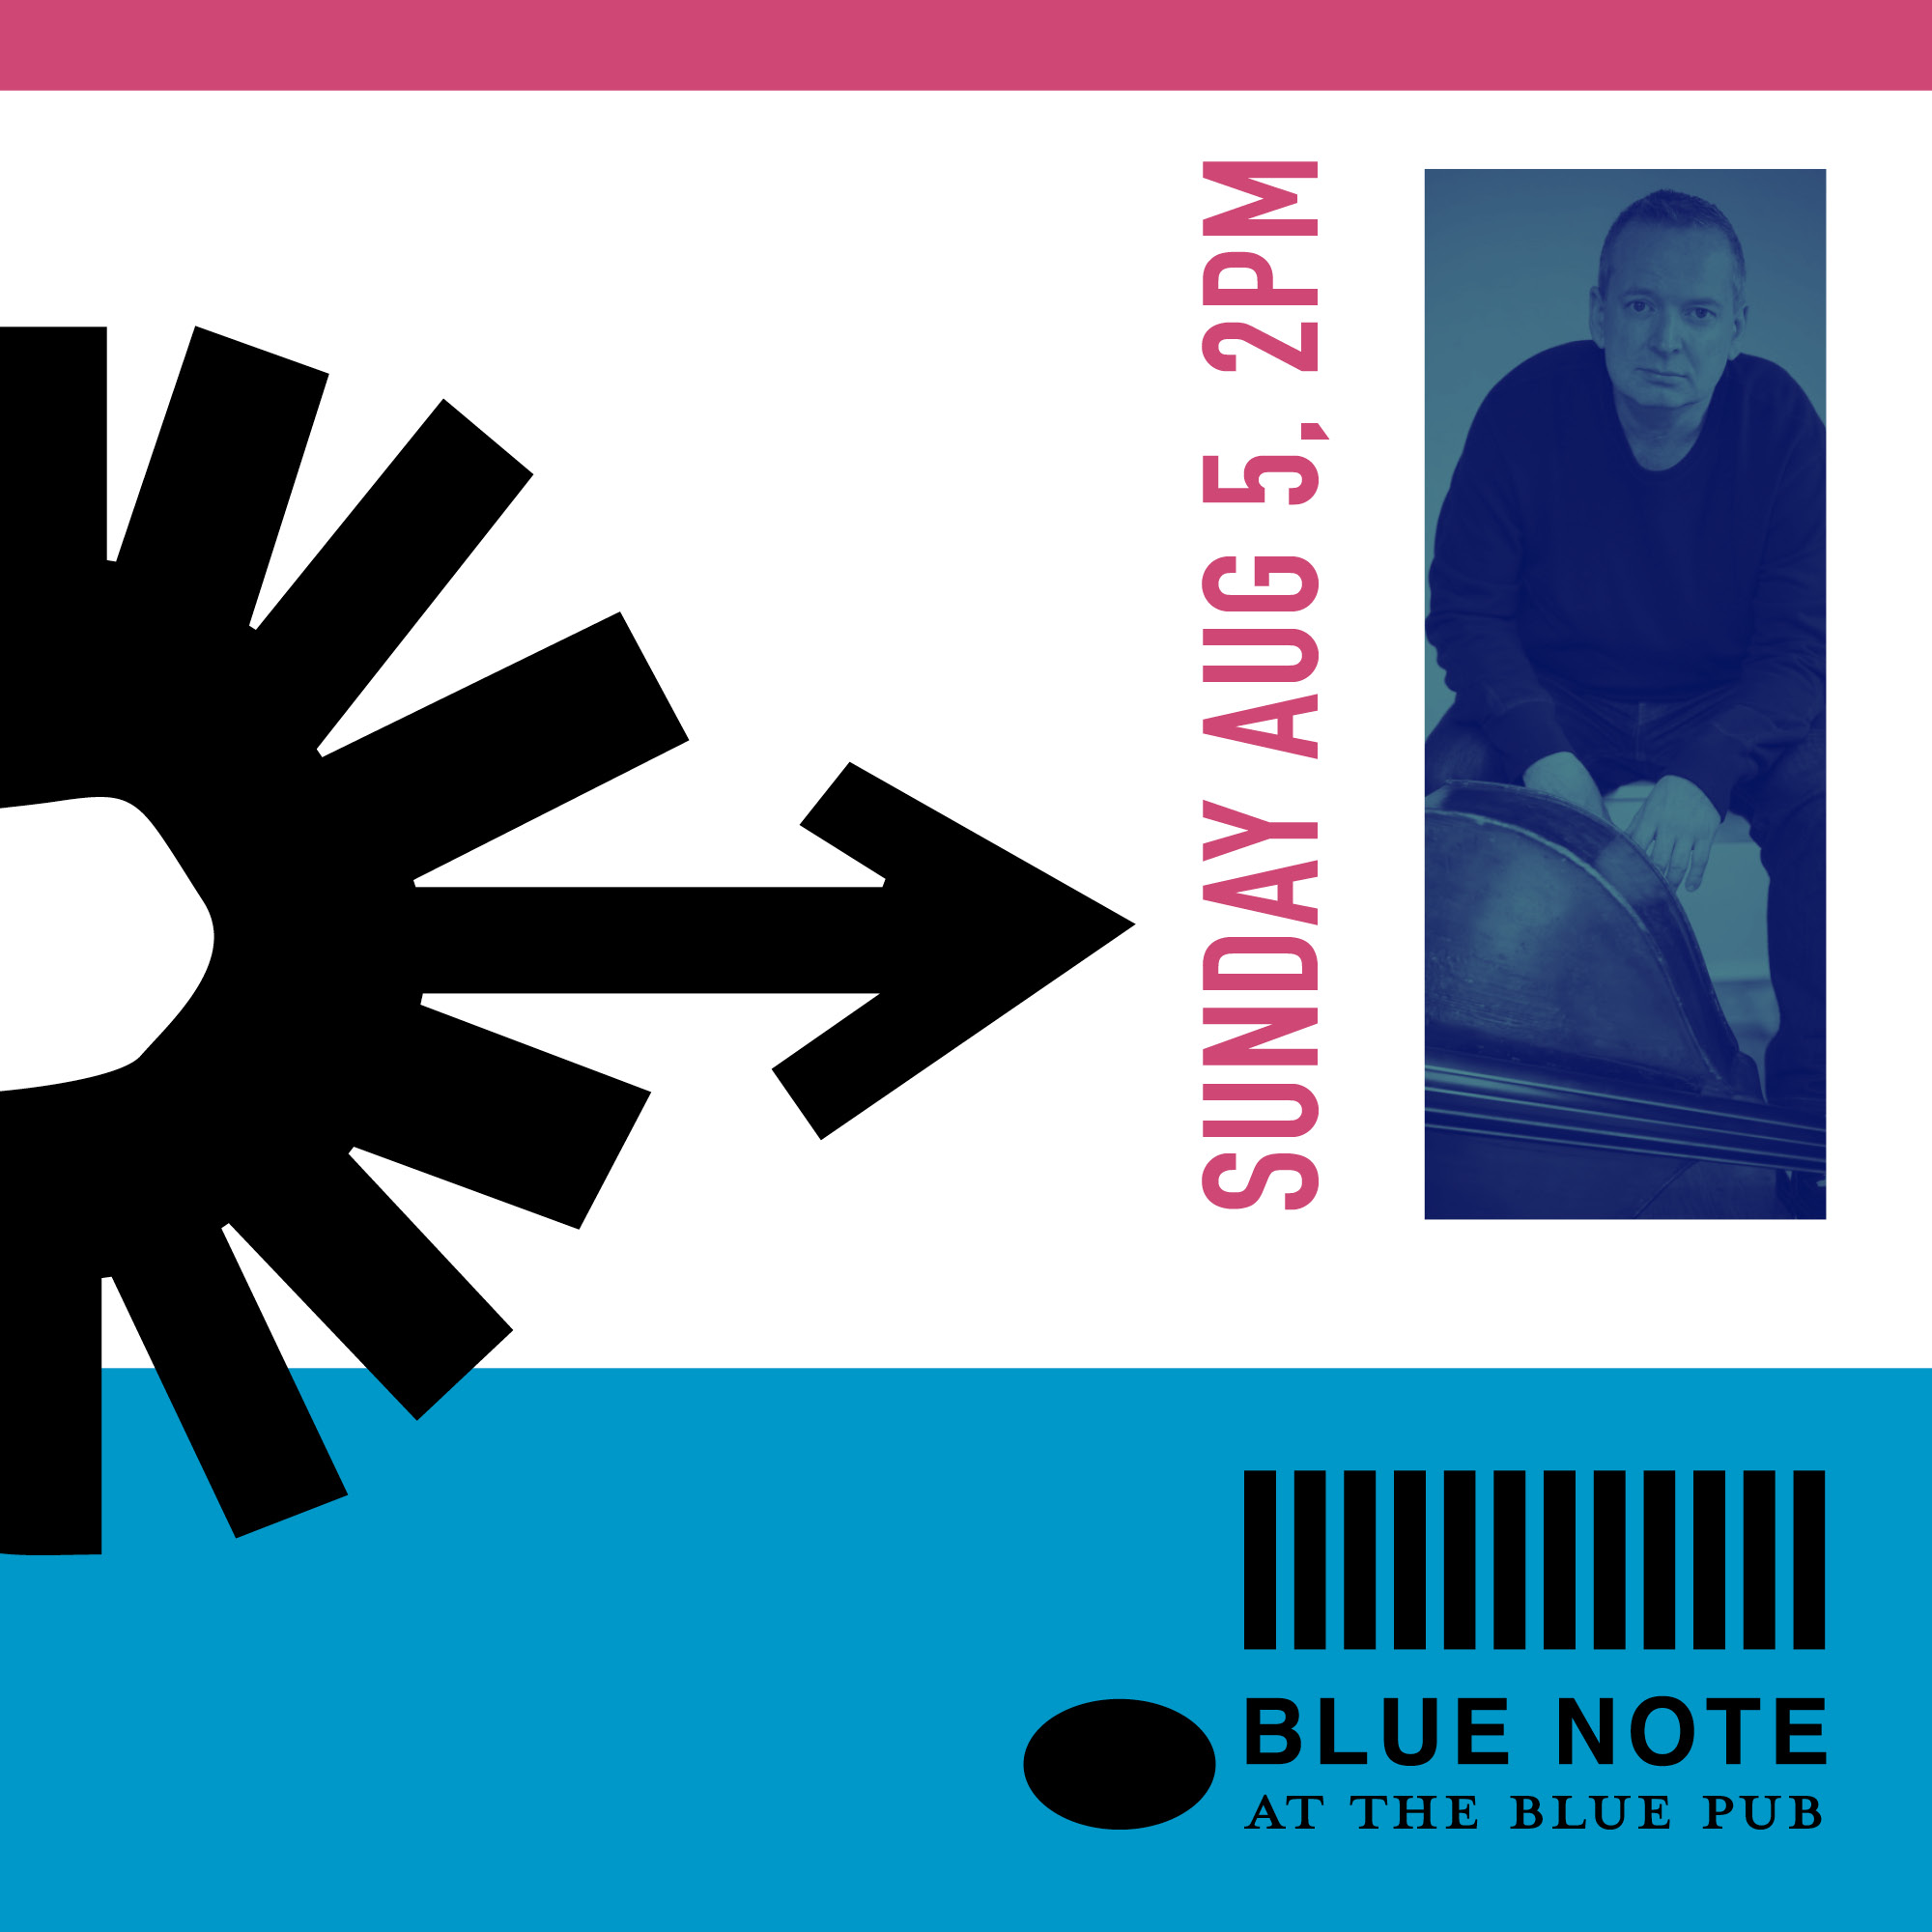 Facebook_Aug Blue Note 3.jpg